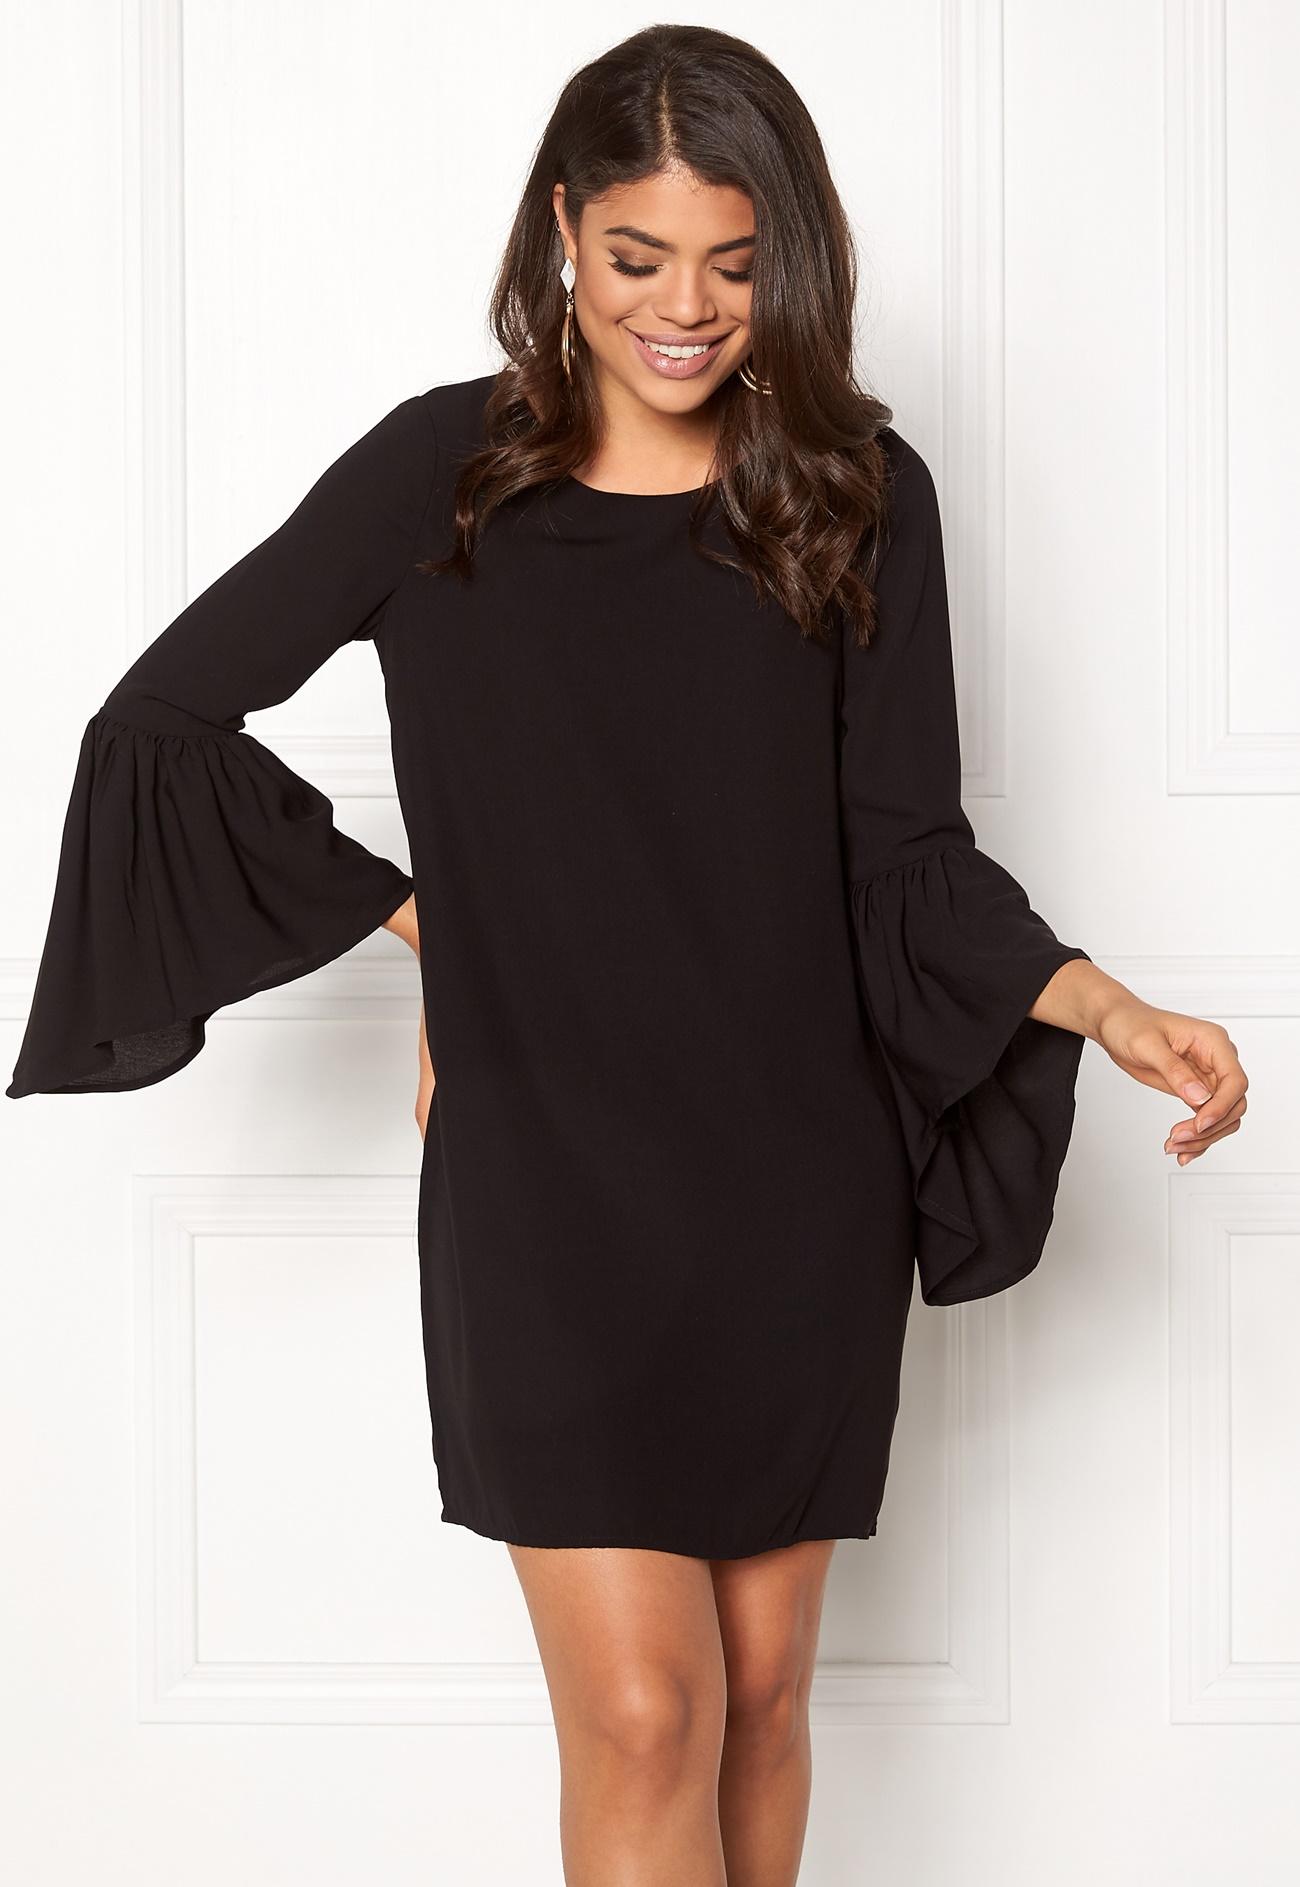 vero moda perfect 3 4 short dress black bubbleroom. Black Bedroom Furniture Sets. Home Design Ideas